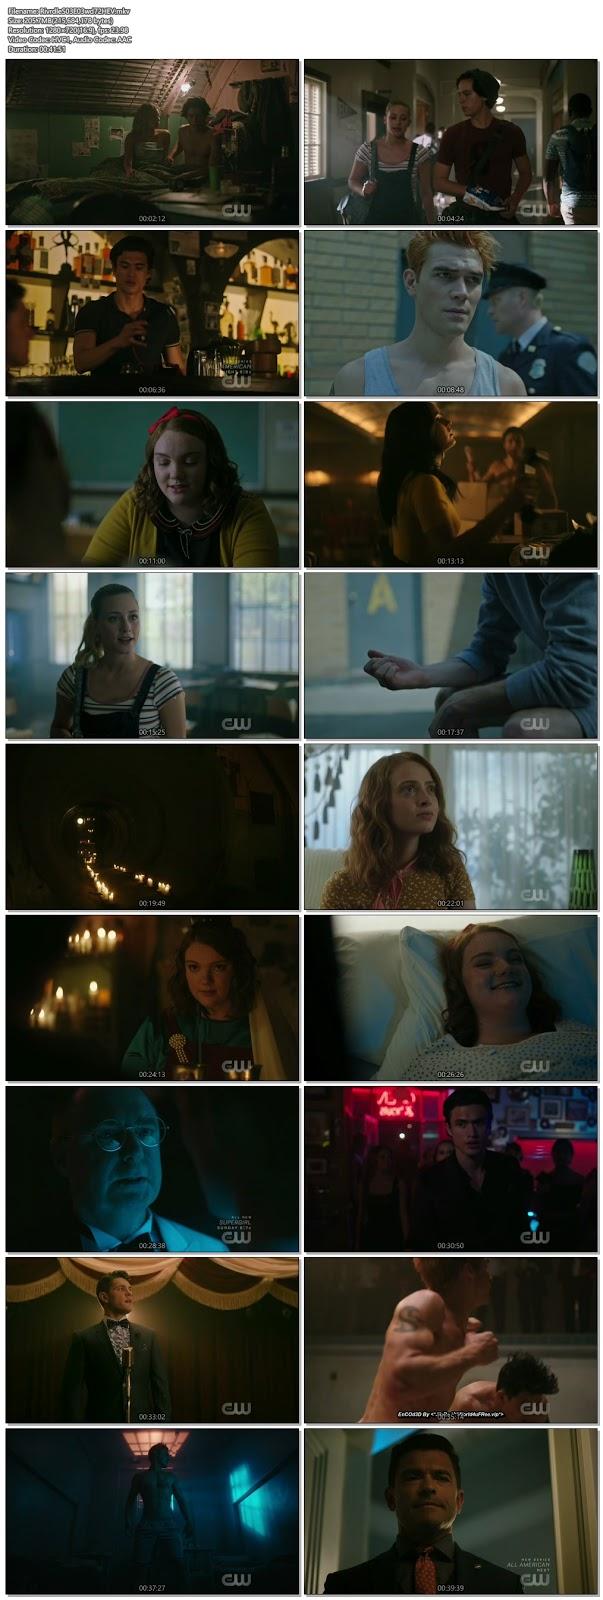 Riverdale S03 Episode 03 720p HDTV 200MB ESub x265 HEVC , hollwood tv series Riverdale S03 Episode 01 720p hdtv tv show hevc x265 hdrip 200mb 250mb free download or watch online at world4ufree.fun